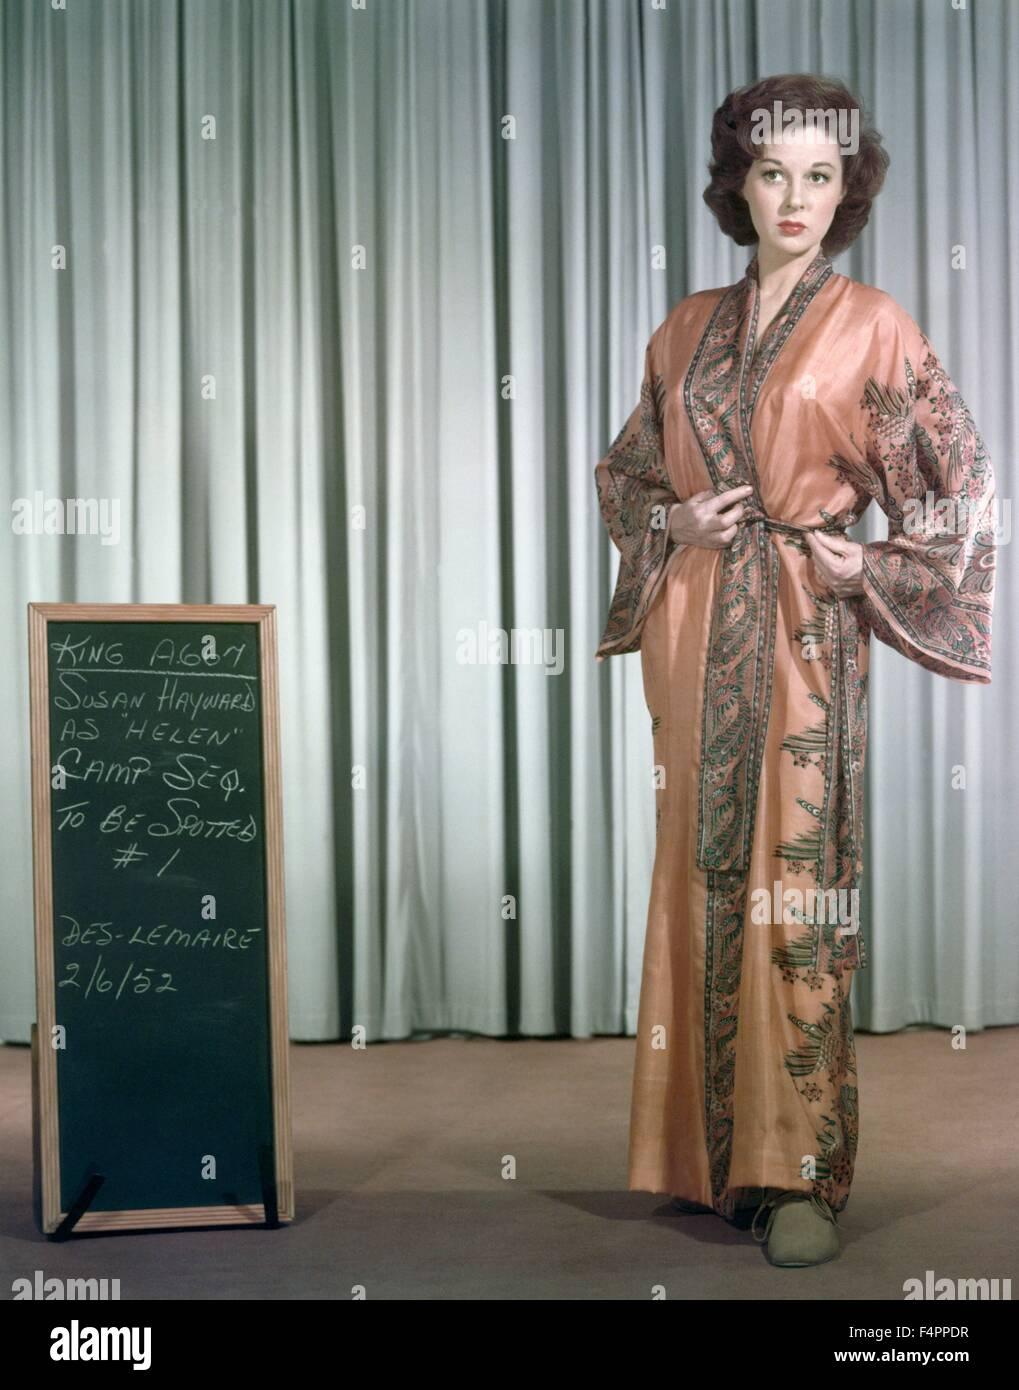 Susan Hayward / The Snows of Kilimanjaro / 1952 directed by Henry King [Twentieth Century Fox Film Corpo] - Stock Image